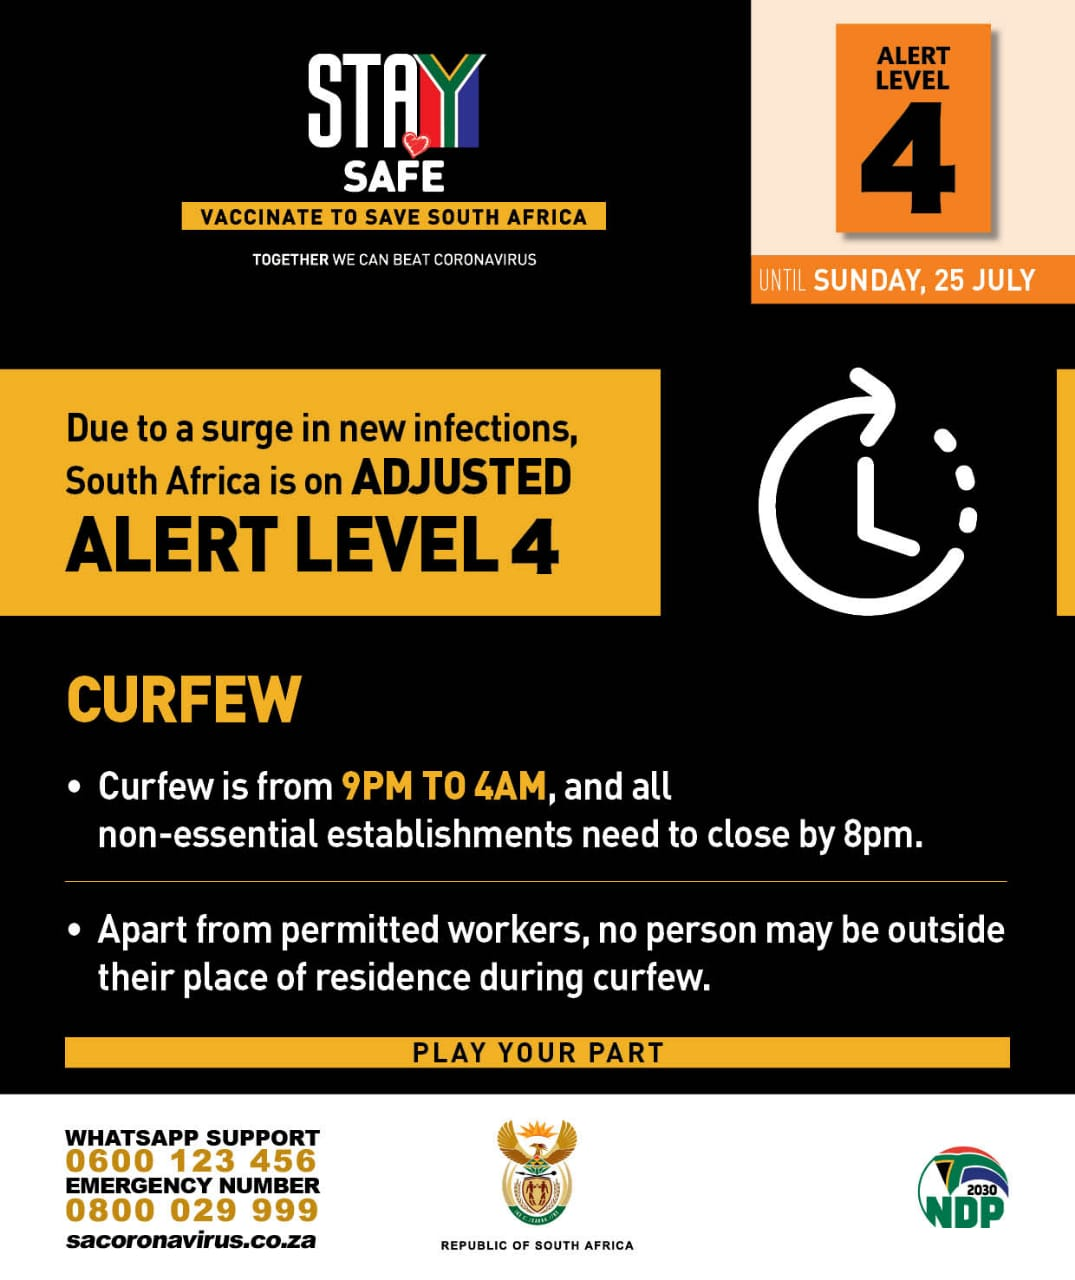 Disaster Management Act Regulations Alert Level 4 During Coronavirus Covid 19 Lockdown As Of 28th June 2021 Sa Corona Virus Online Portal